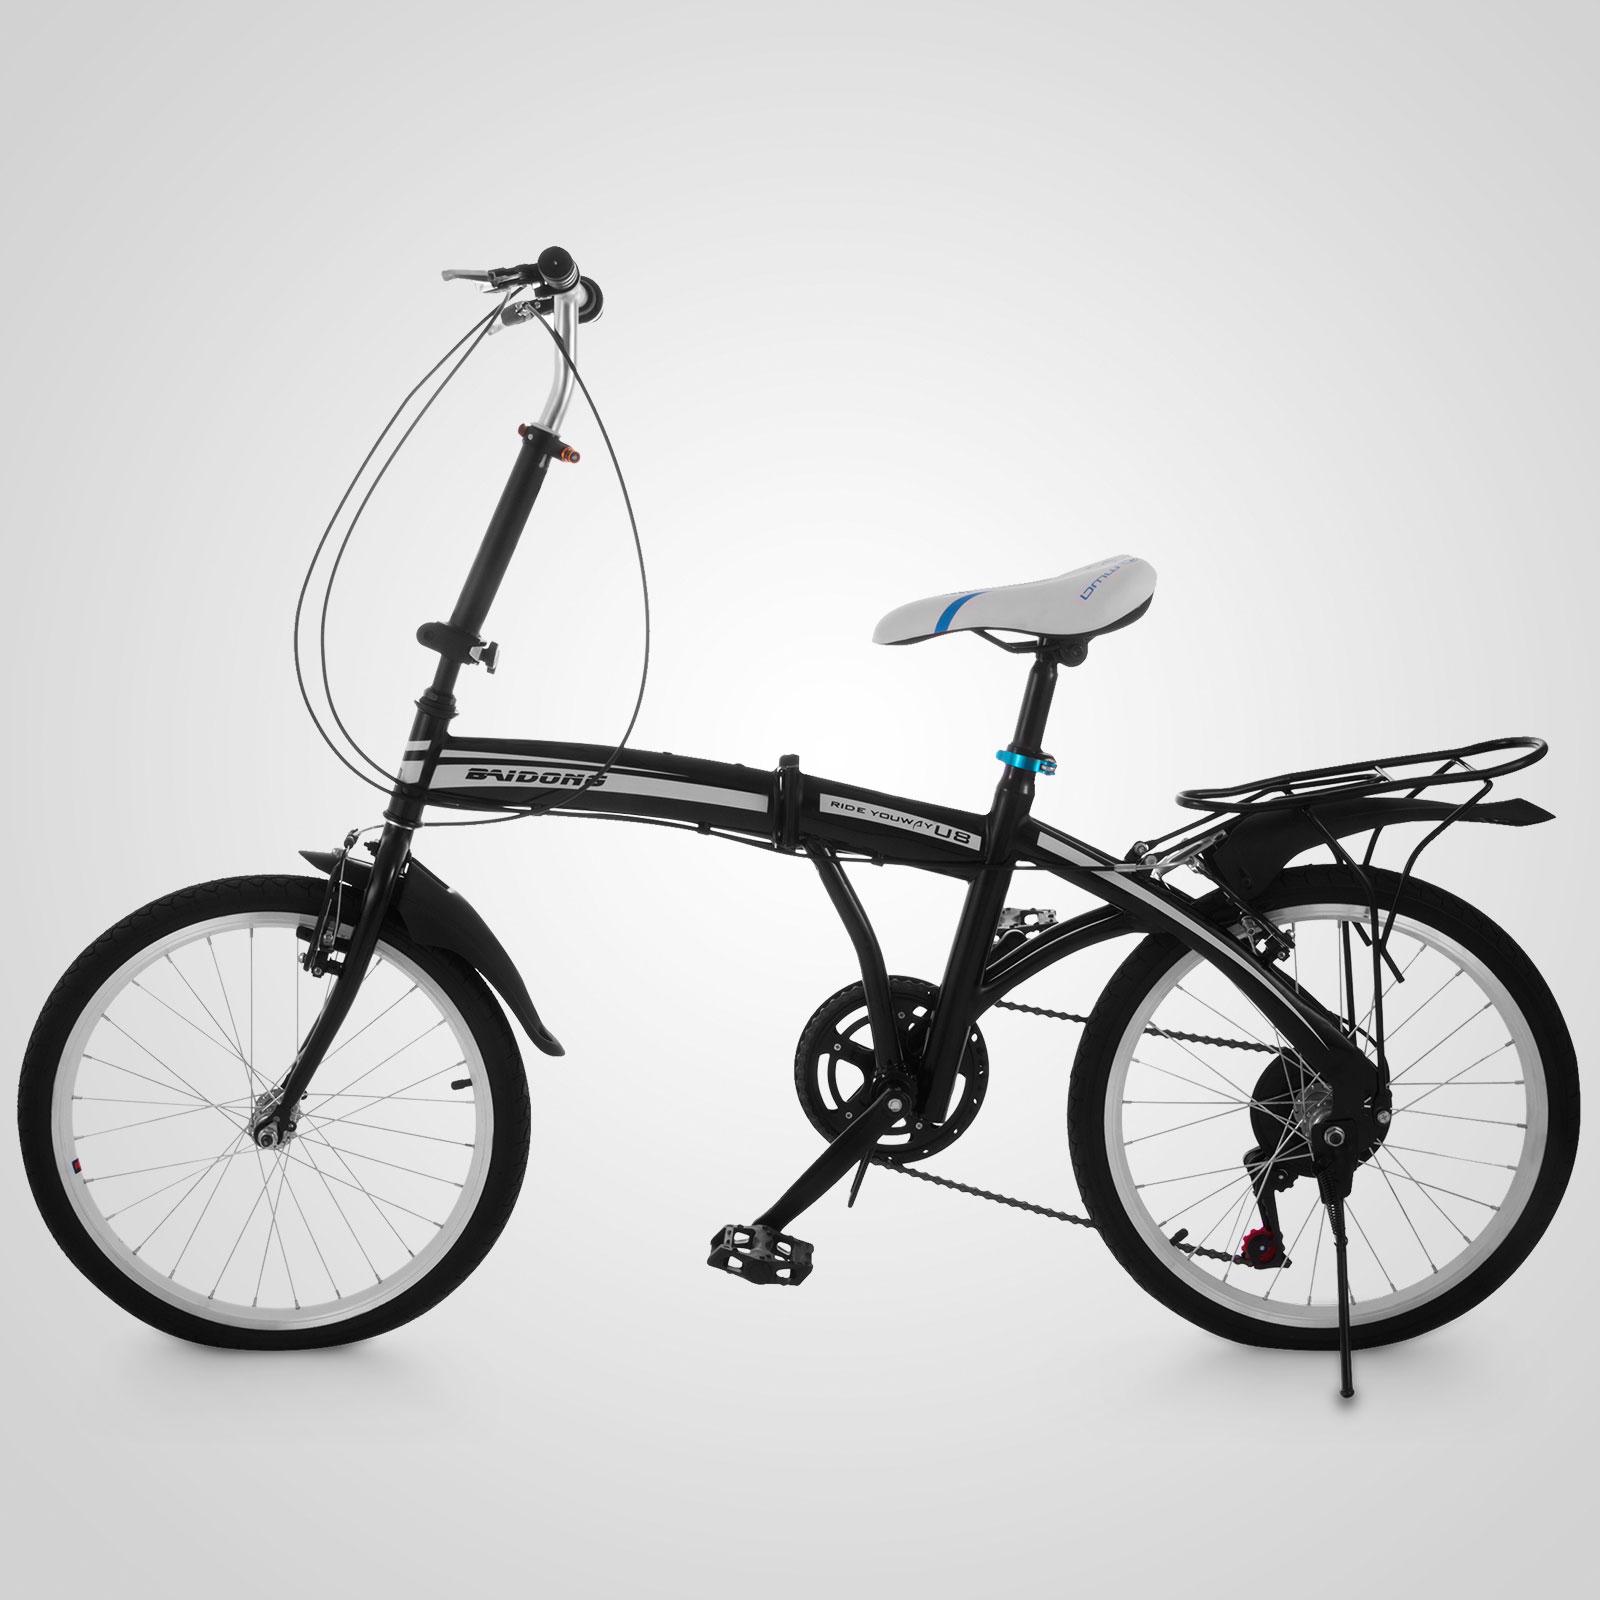 20 mini folding bike 6 speed foldable bicycle storage shimano adult ride cycle ebay. Black Bedroom Furniture Sets. Home Design Ideas